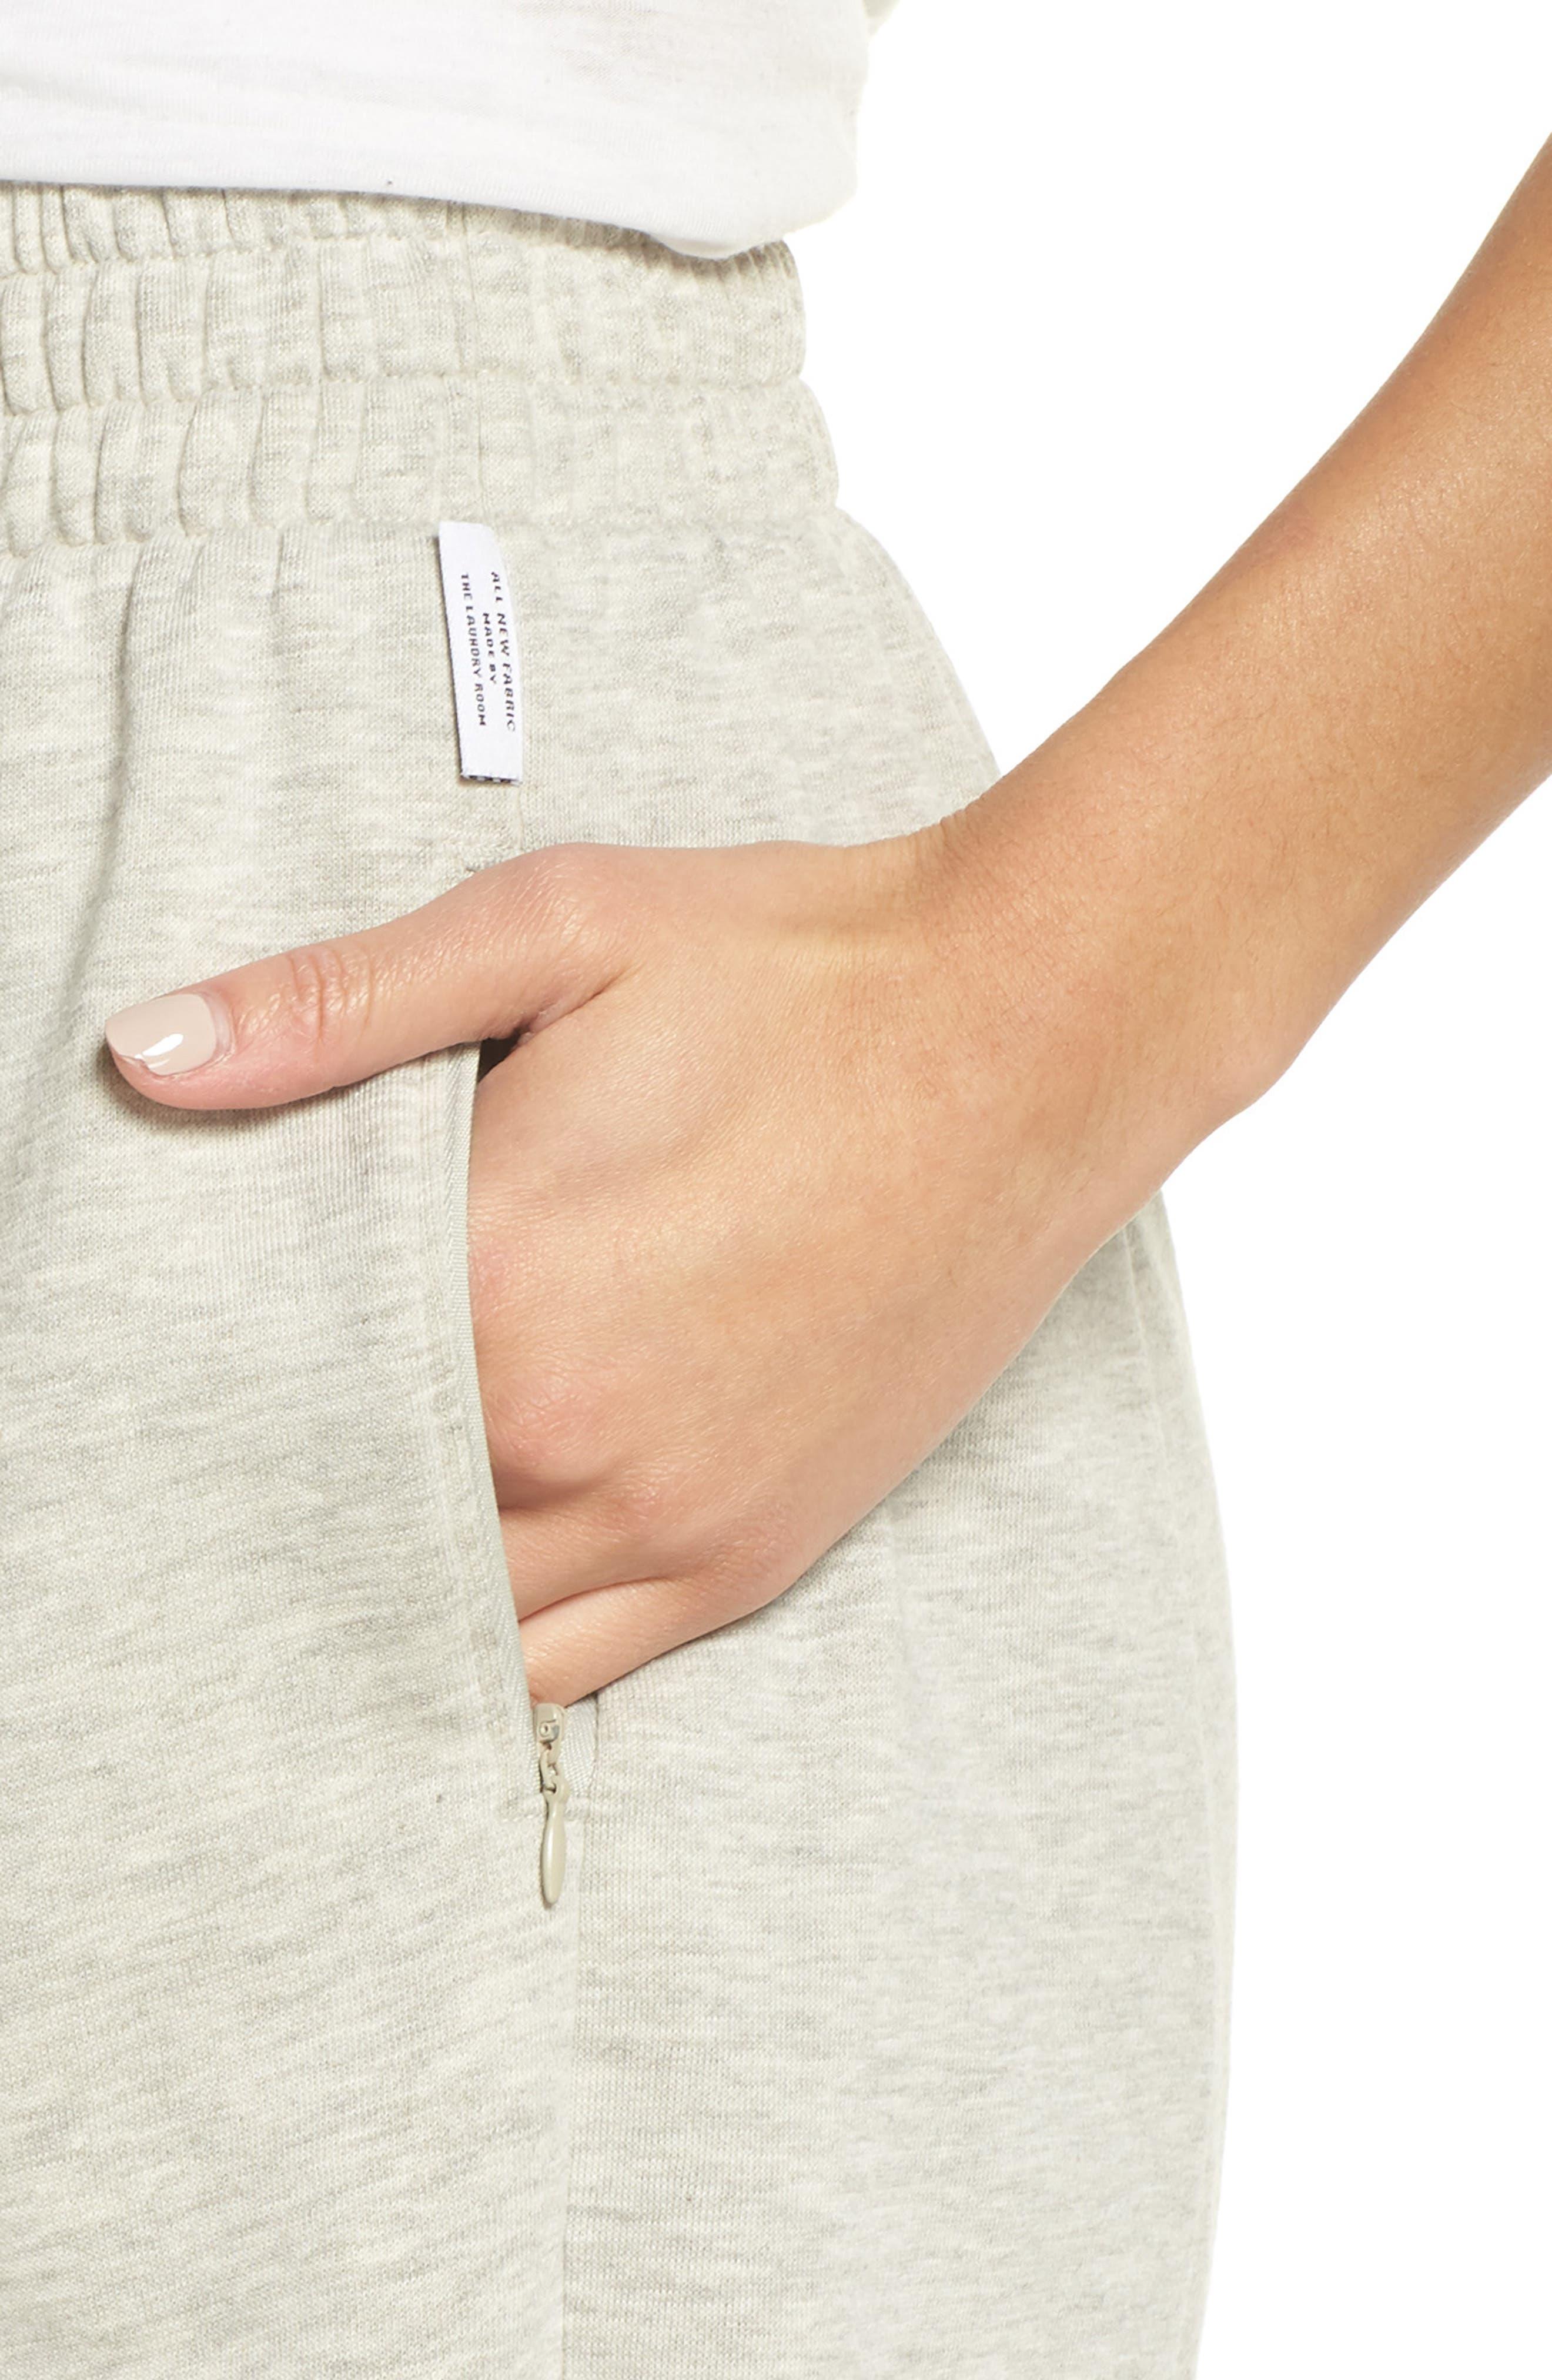 Bermuda Lounge Shorts,                             Alternate thumbnail 4, color,                             PEBBLE HEATHER